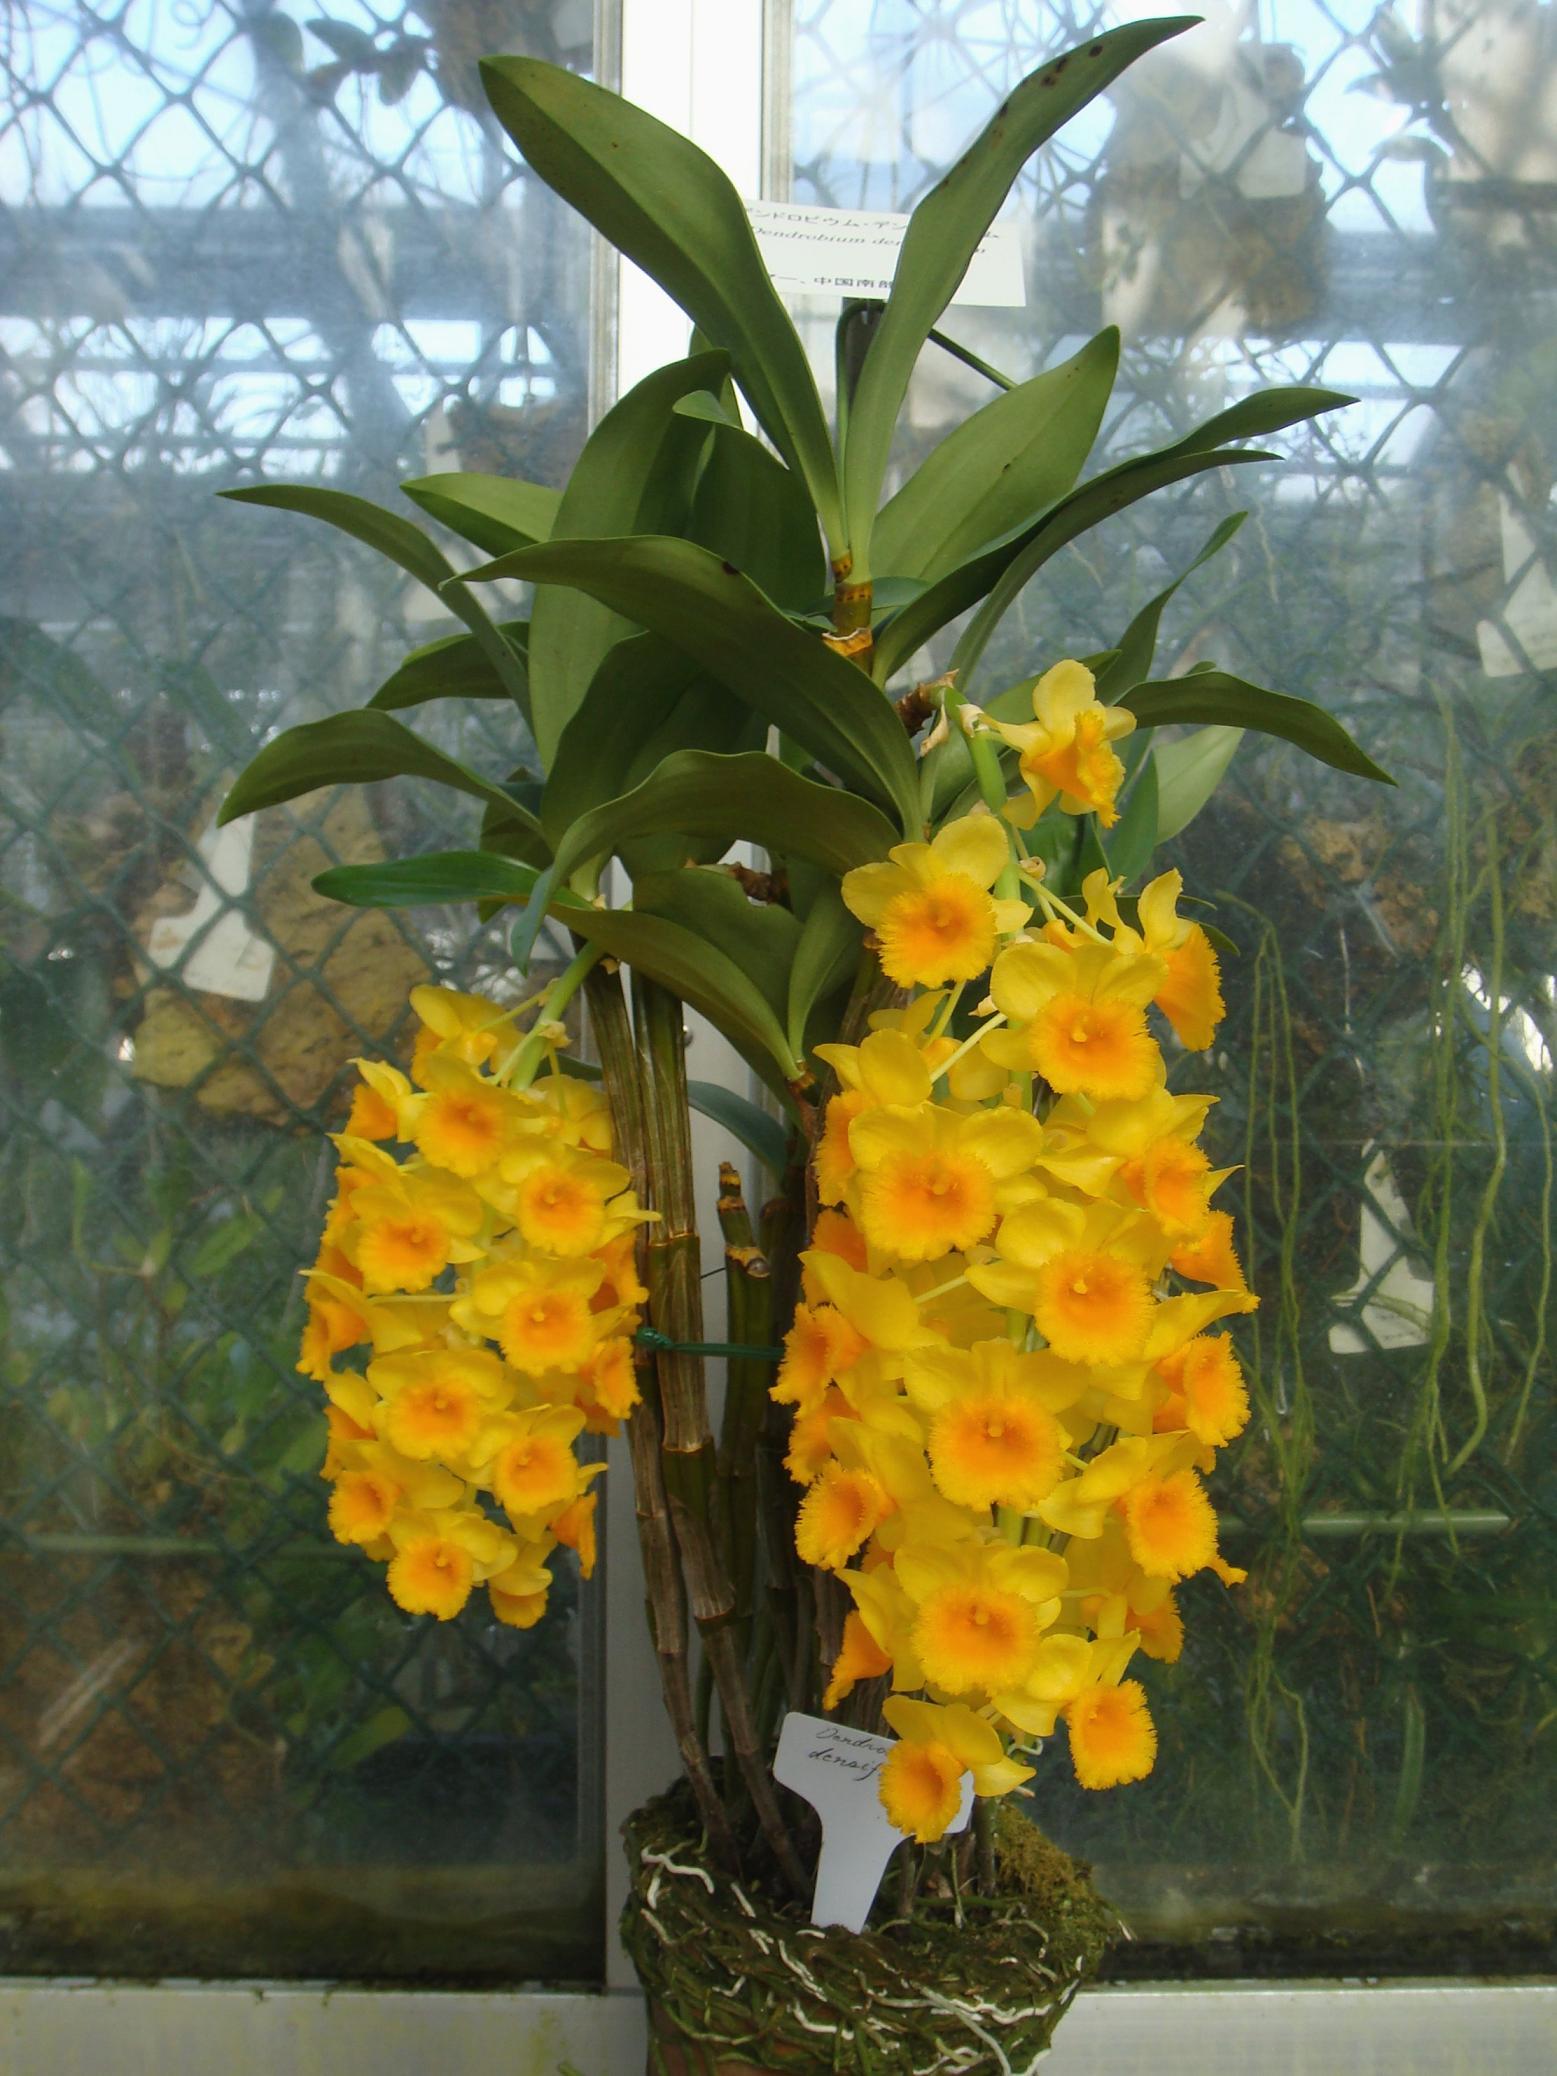 http://orchids.la.coocan.jp/Dendrobium/Dendrobium%20densiflorum/DSC04230.JPG